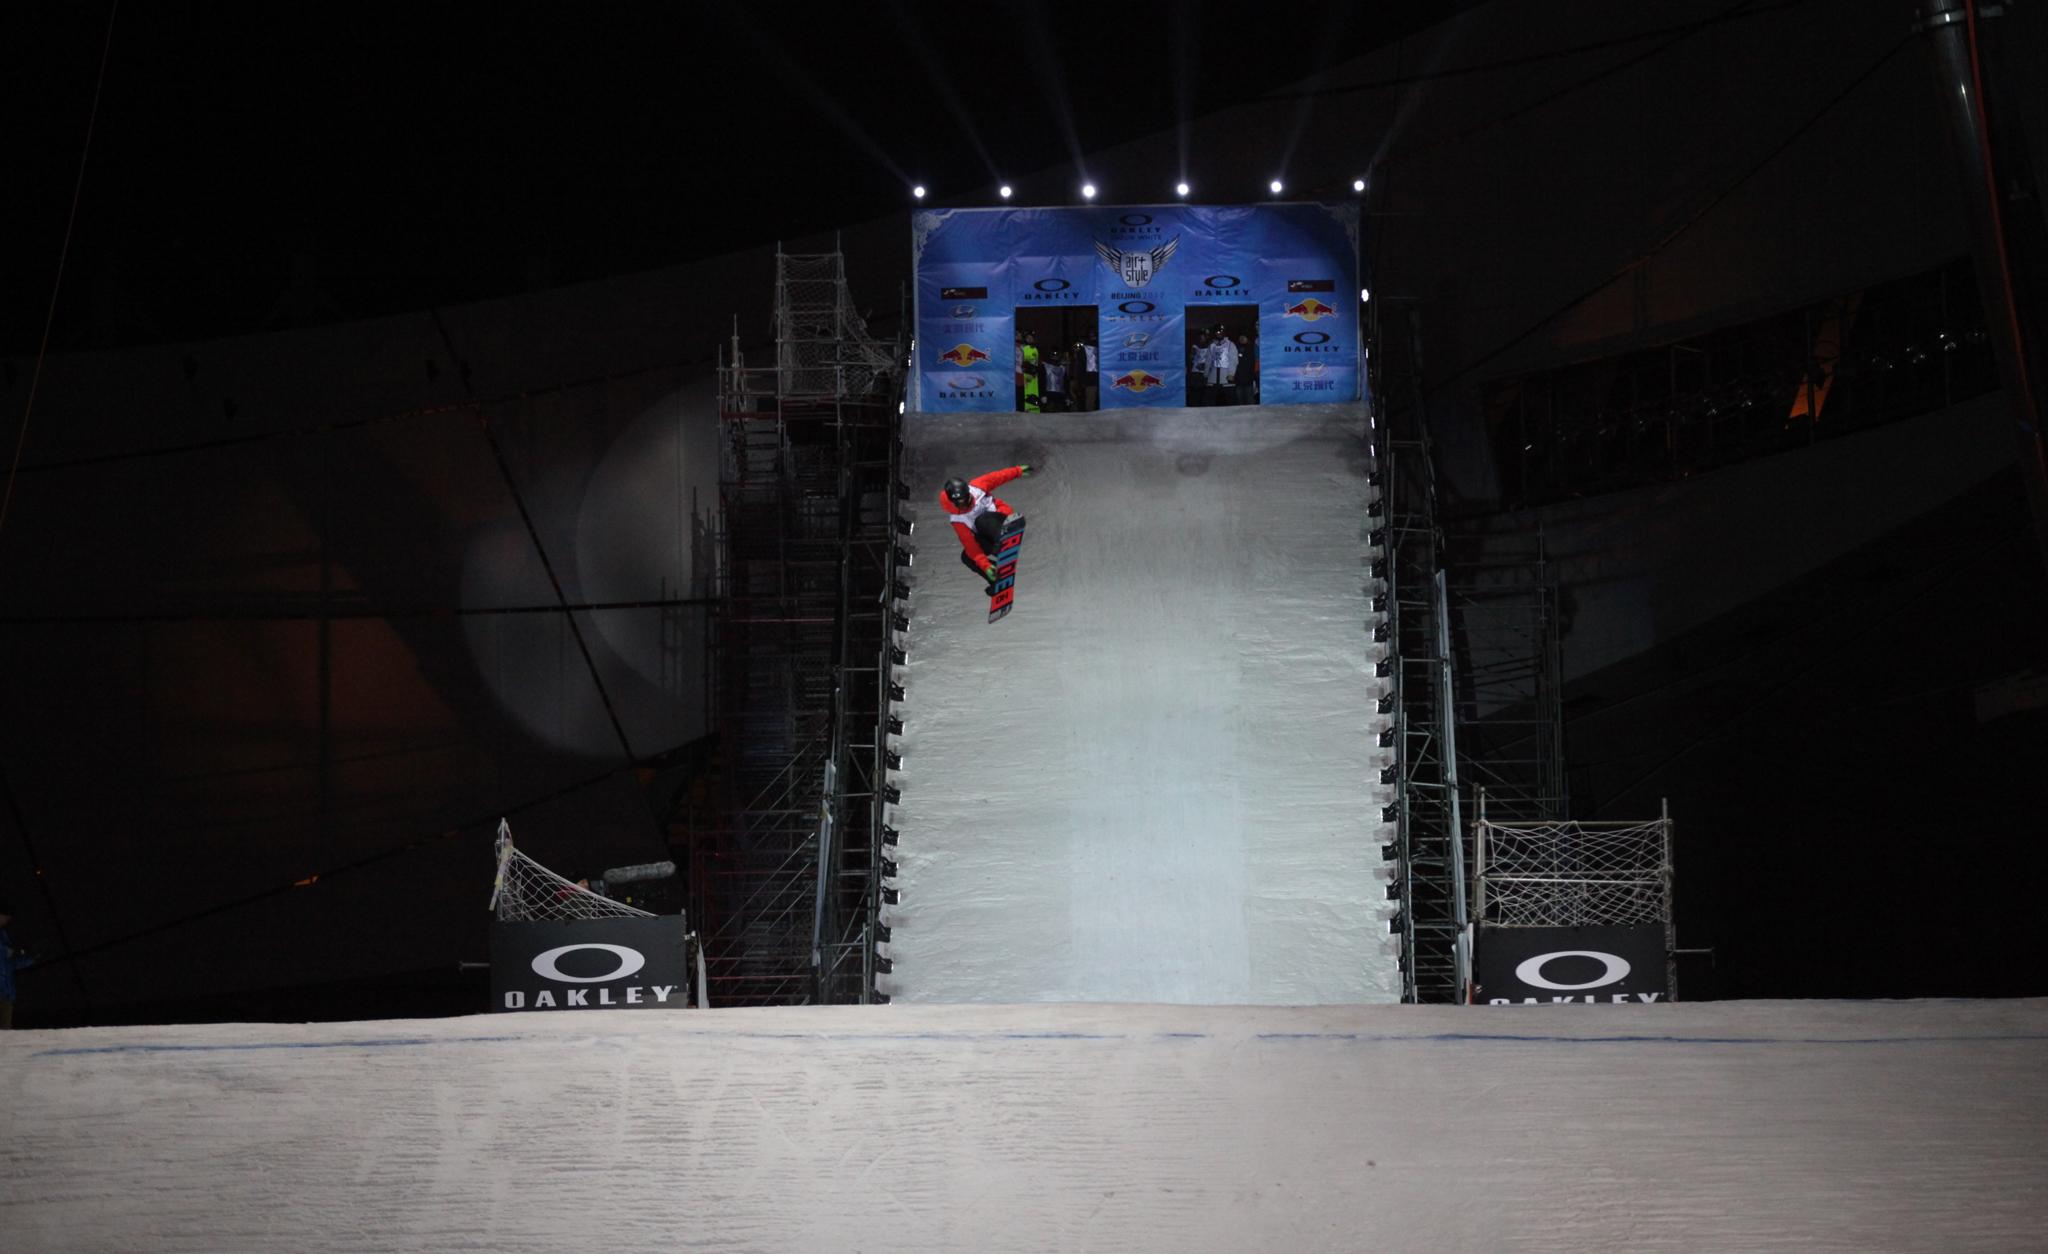 December 2012, Beijingbr Winner: Yuki Kadono